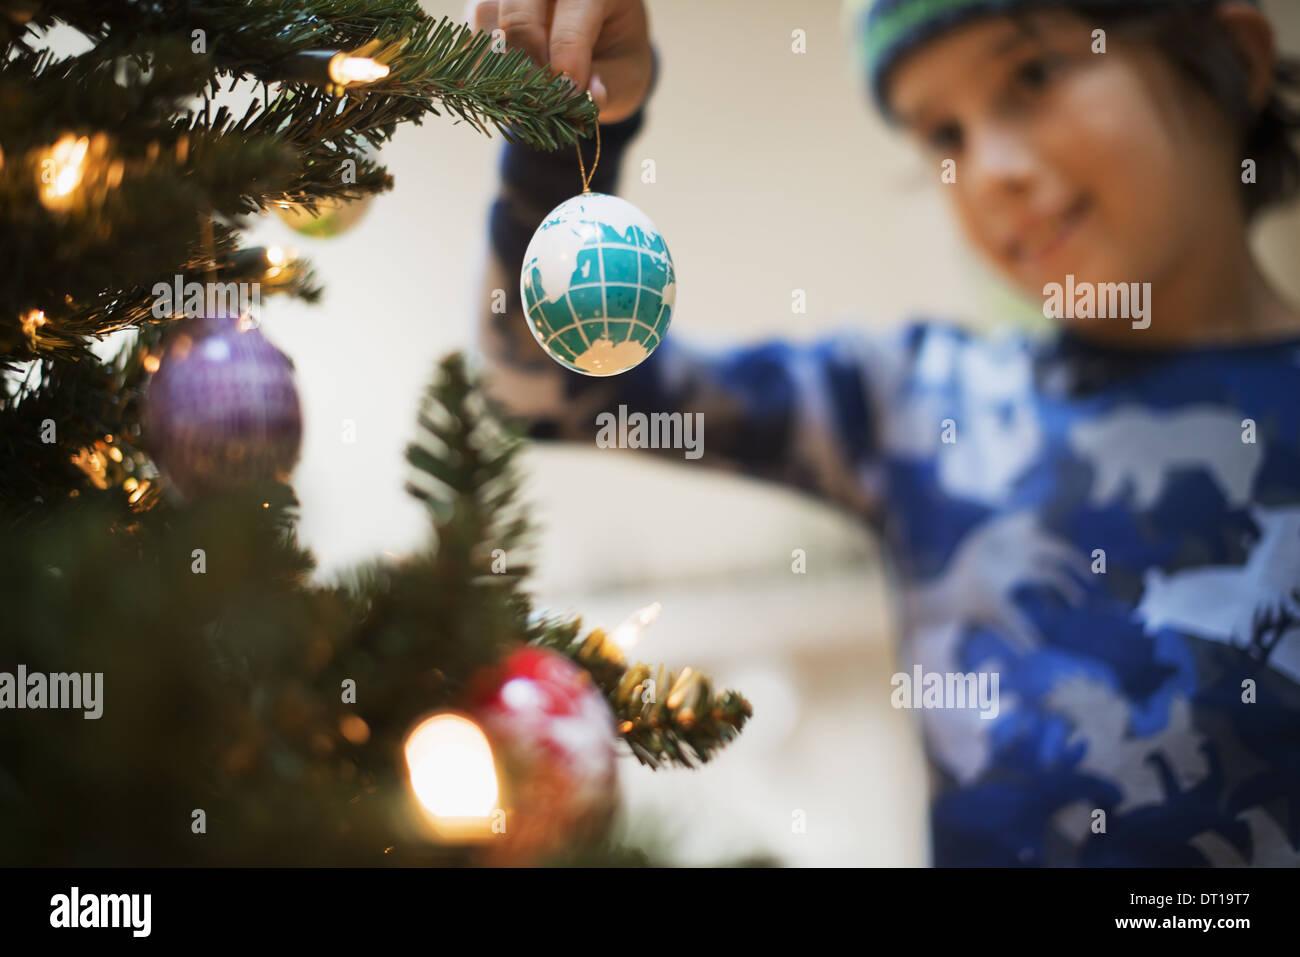 Woodstock New York USA boy placing Christmas ornaments on tree - Stock Image